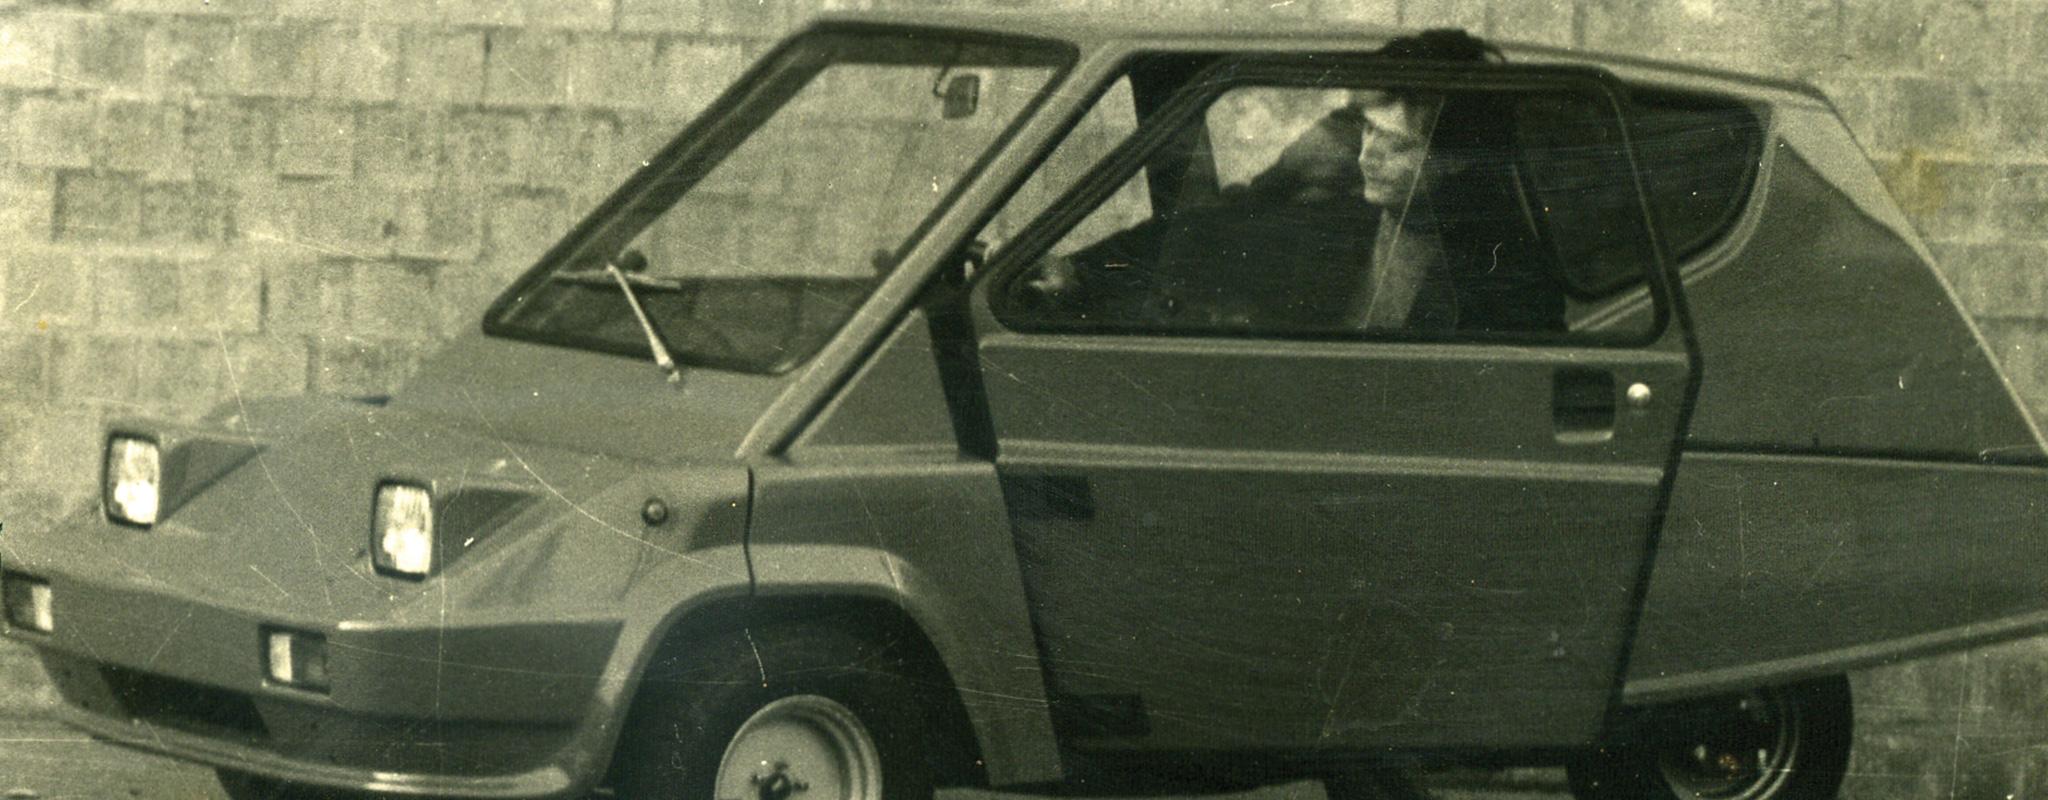 Paolo Pasquini's electric vehicles - Valentine - Studio Pasquini Design